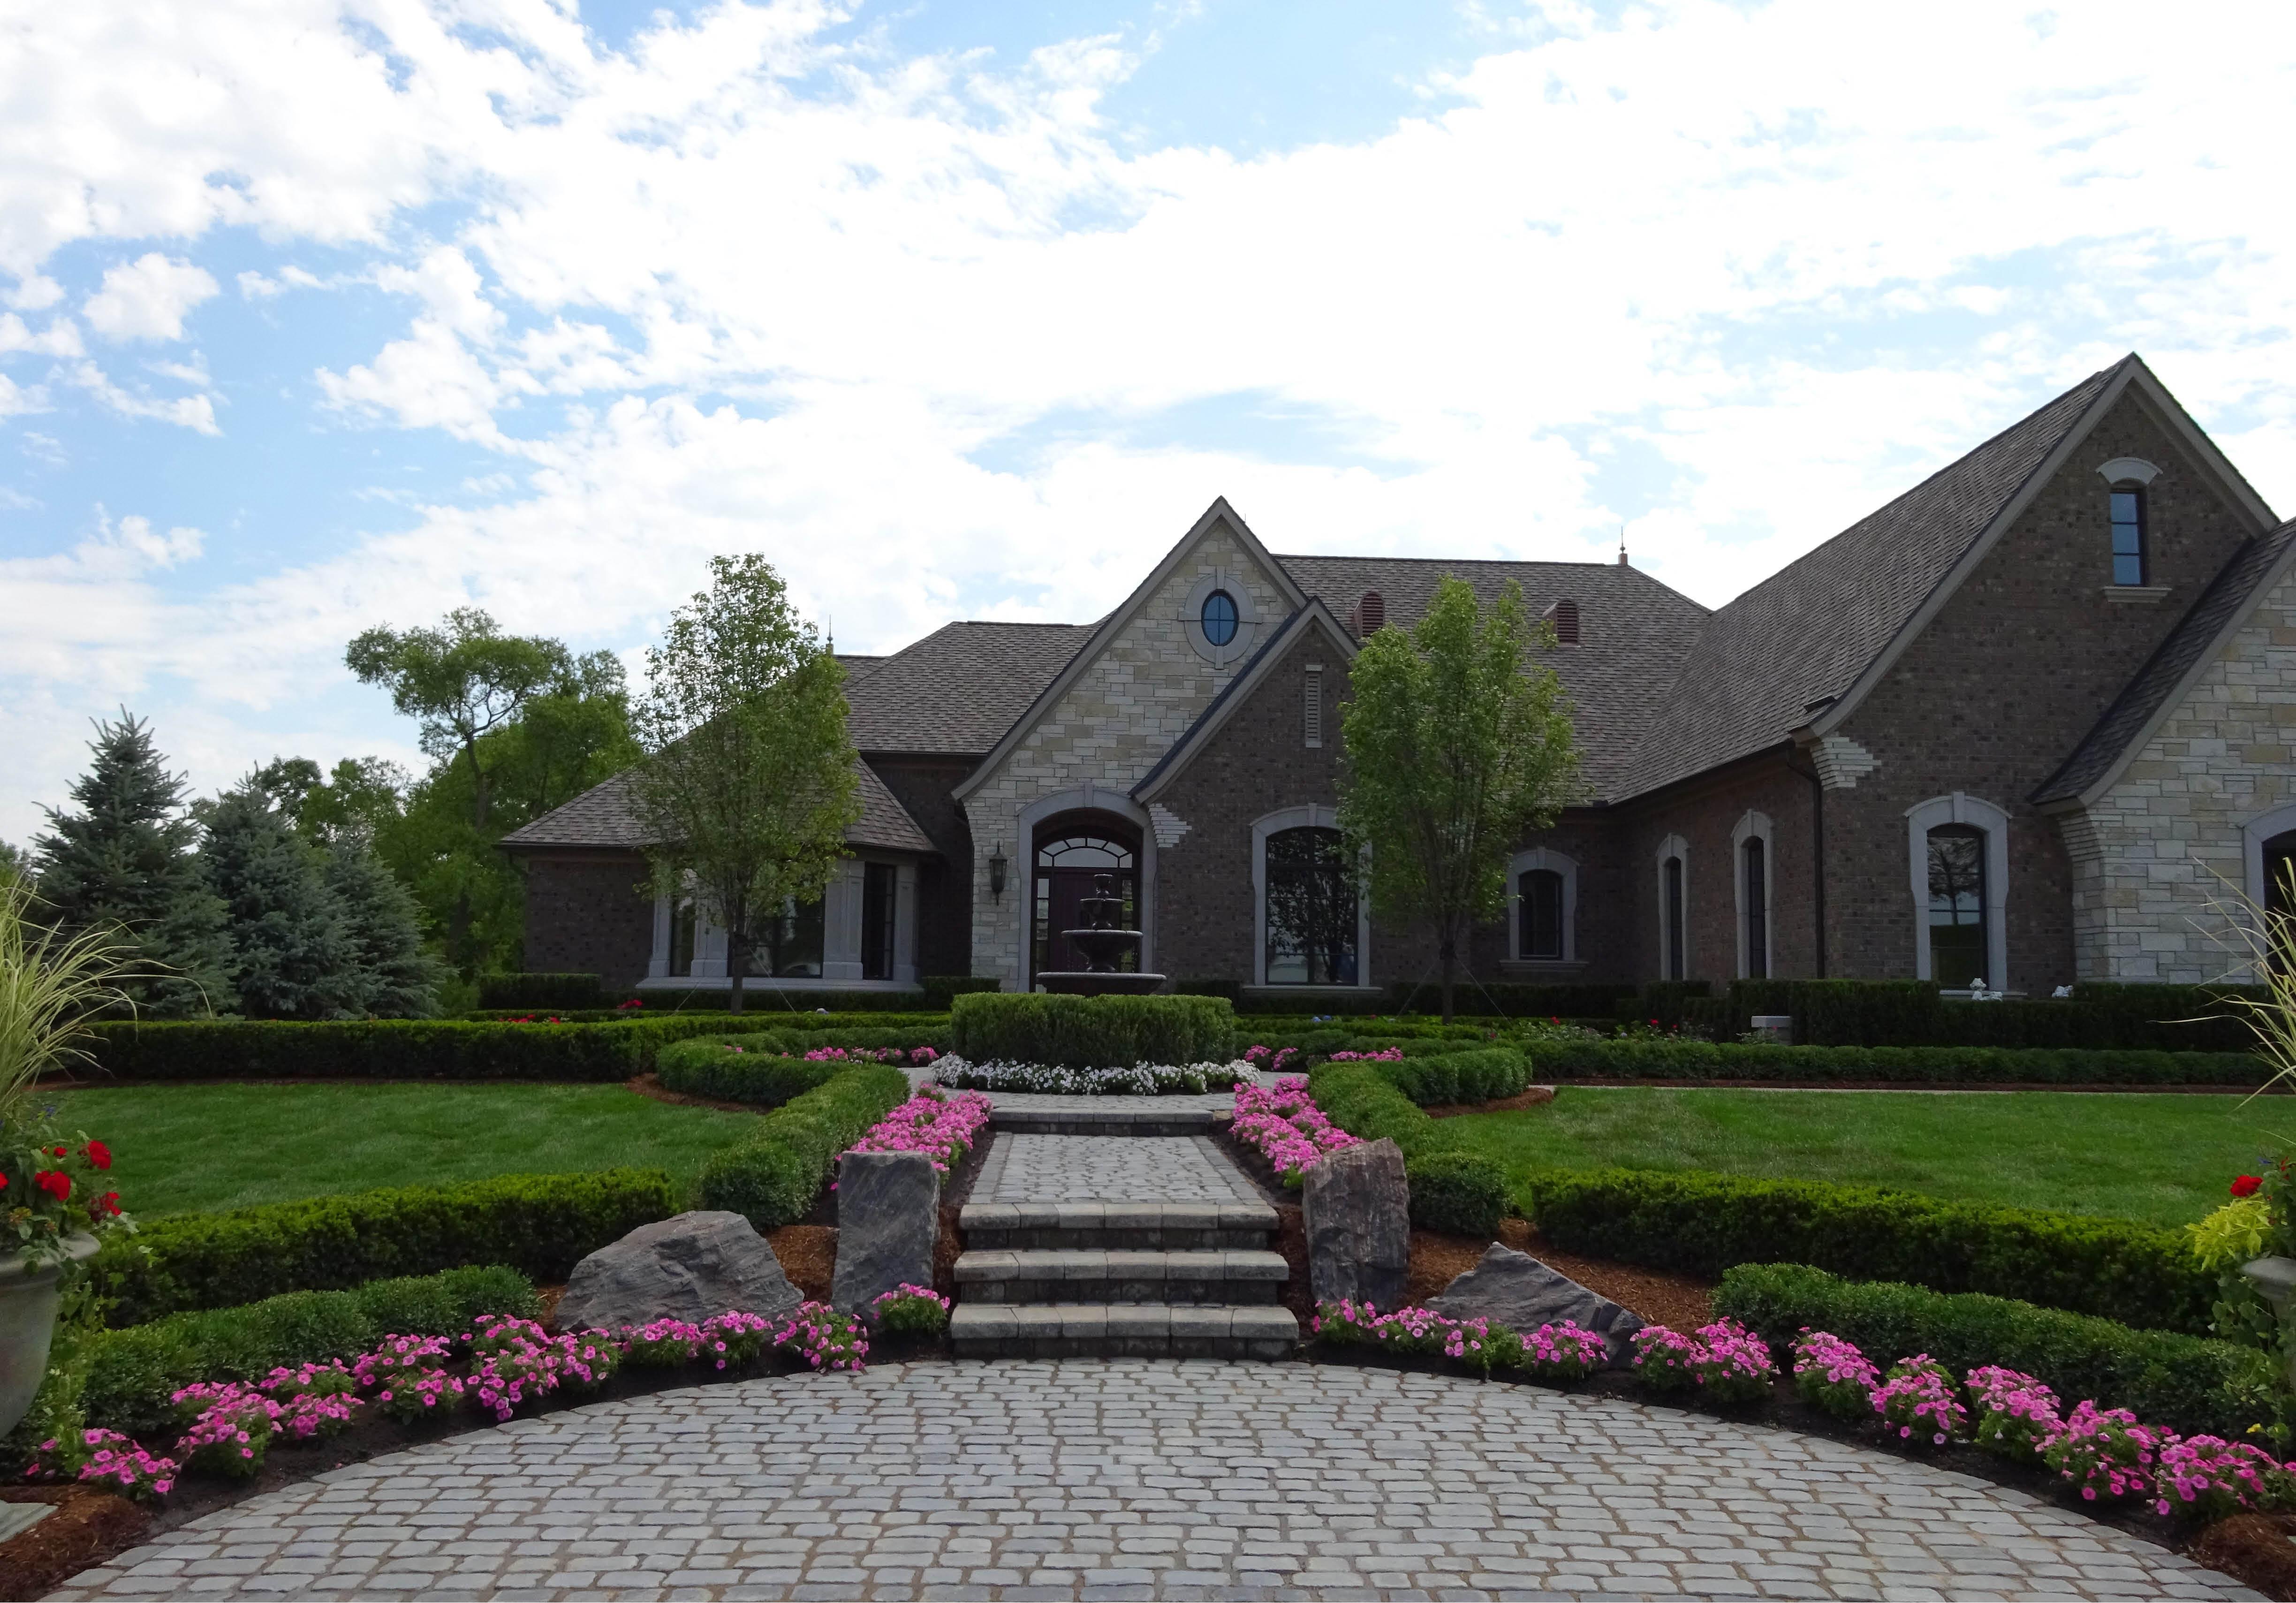 landscape design, landscape services, landscaping, landscaping design, landscape installation, landscaping installation